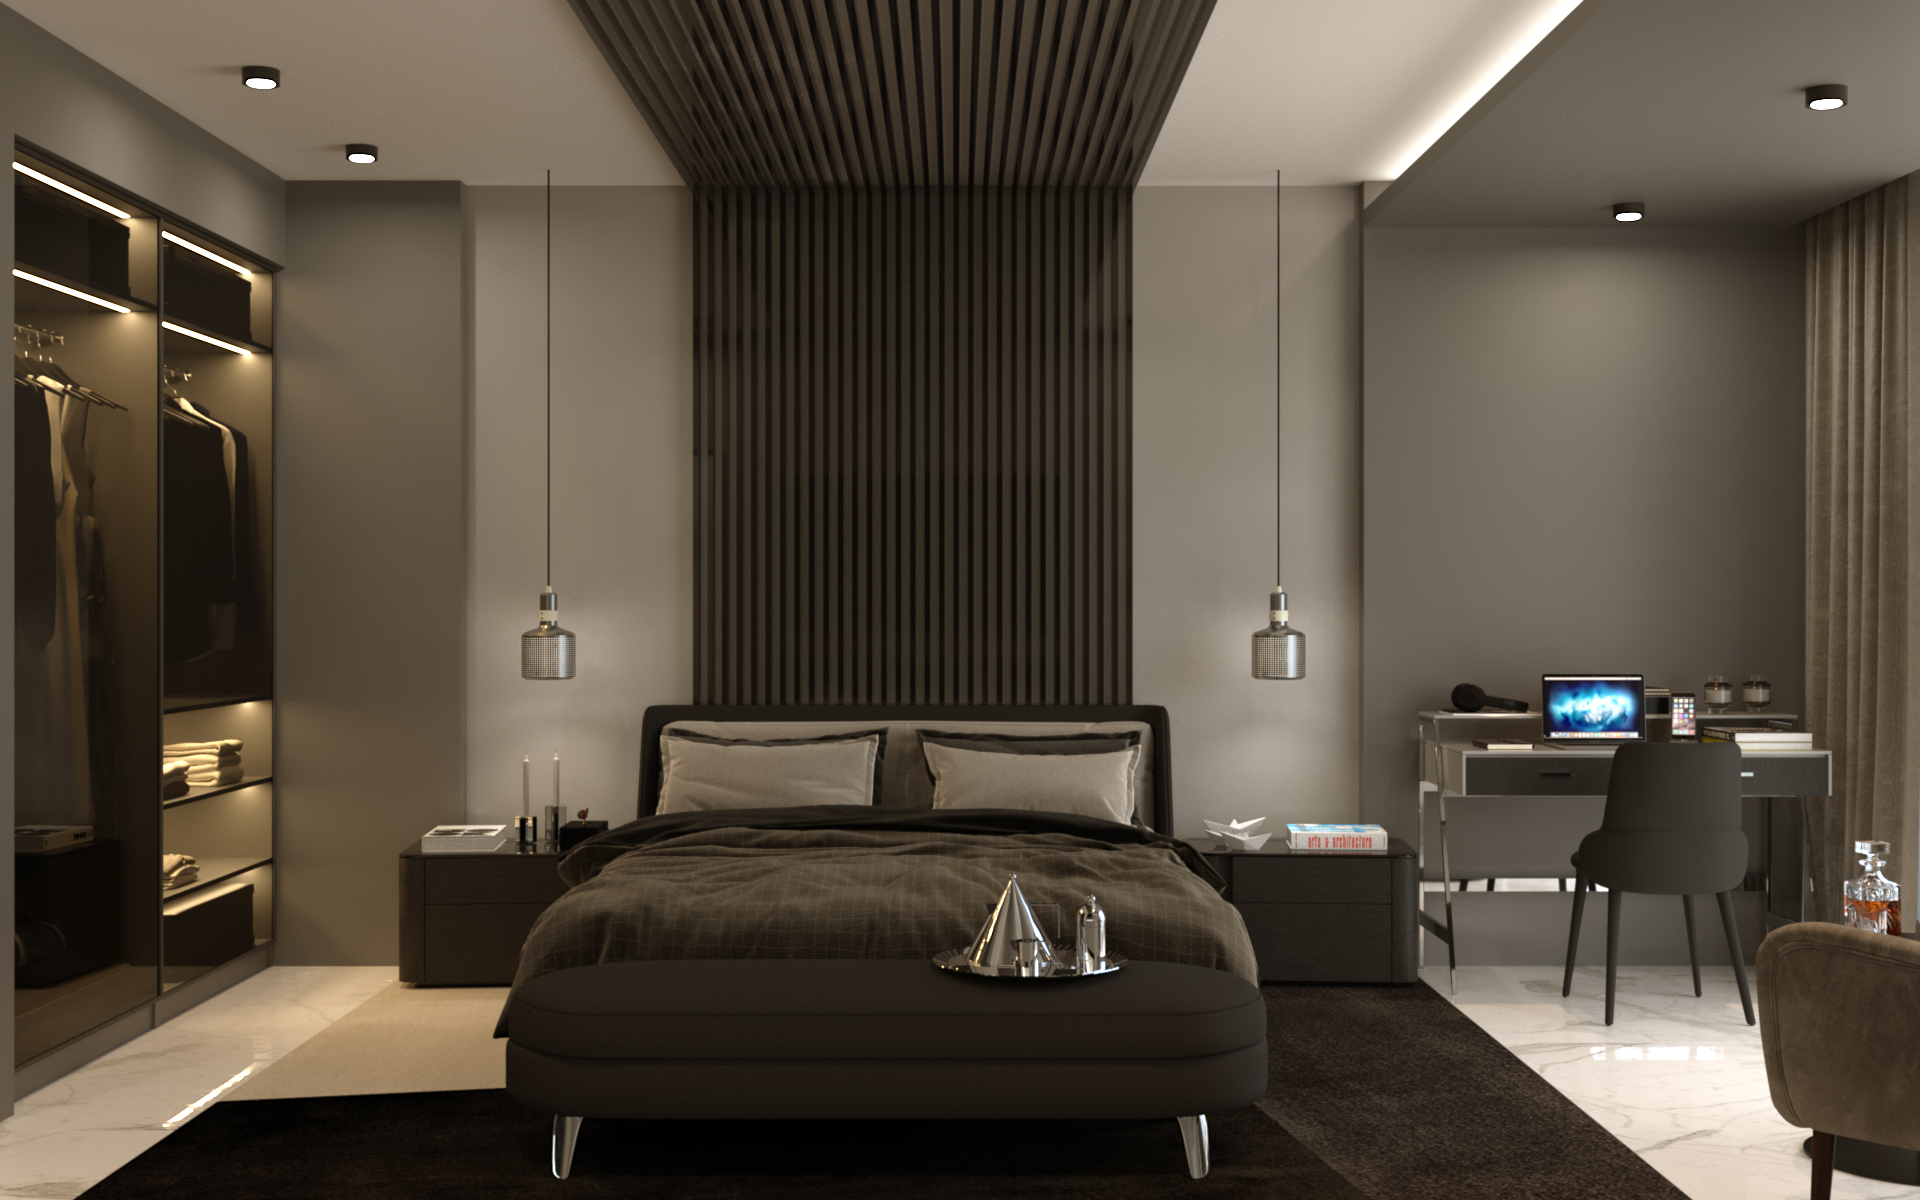 Dormitorio_Vivienda_Barcelona_002